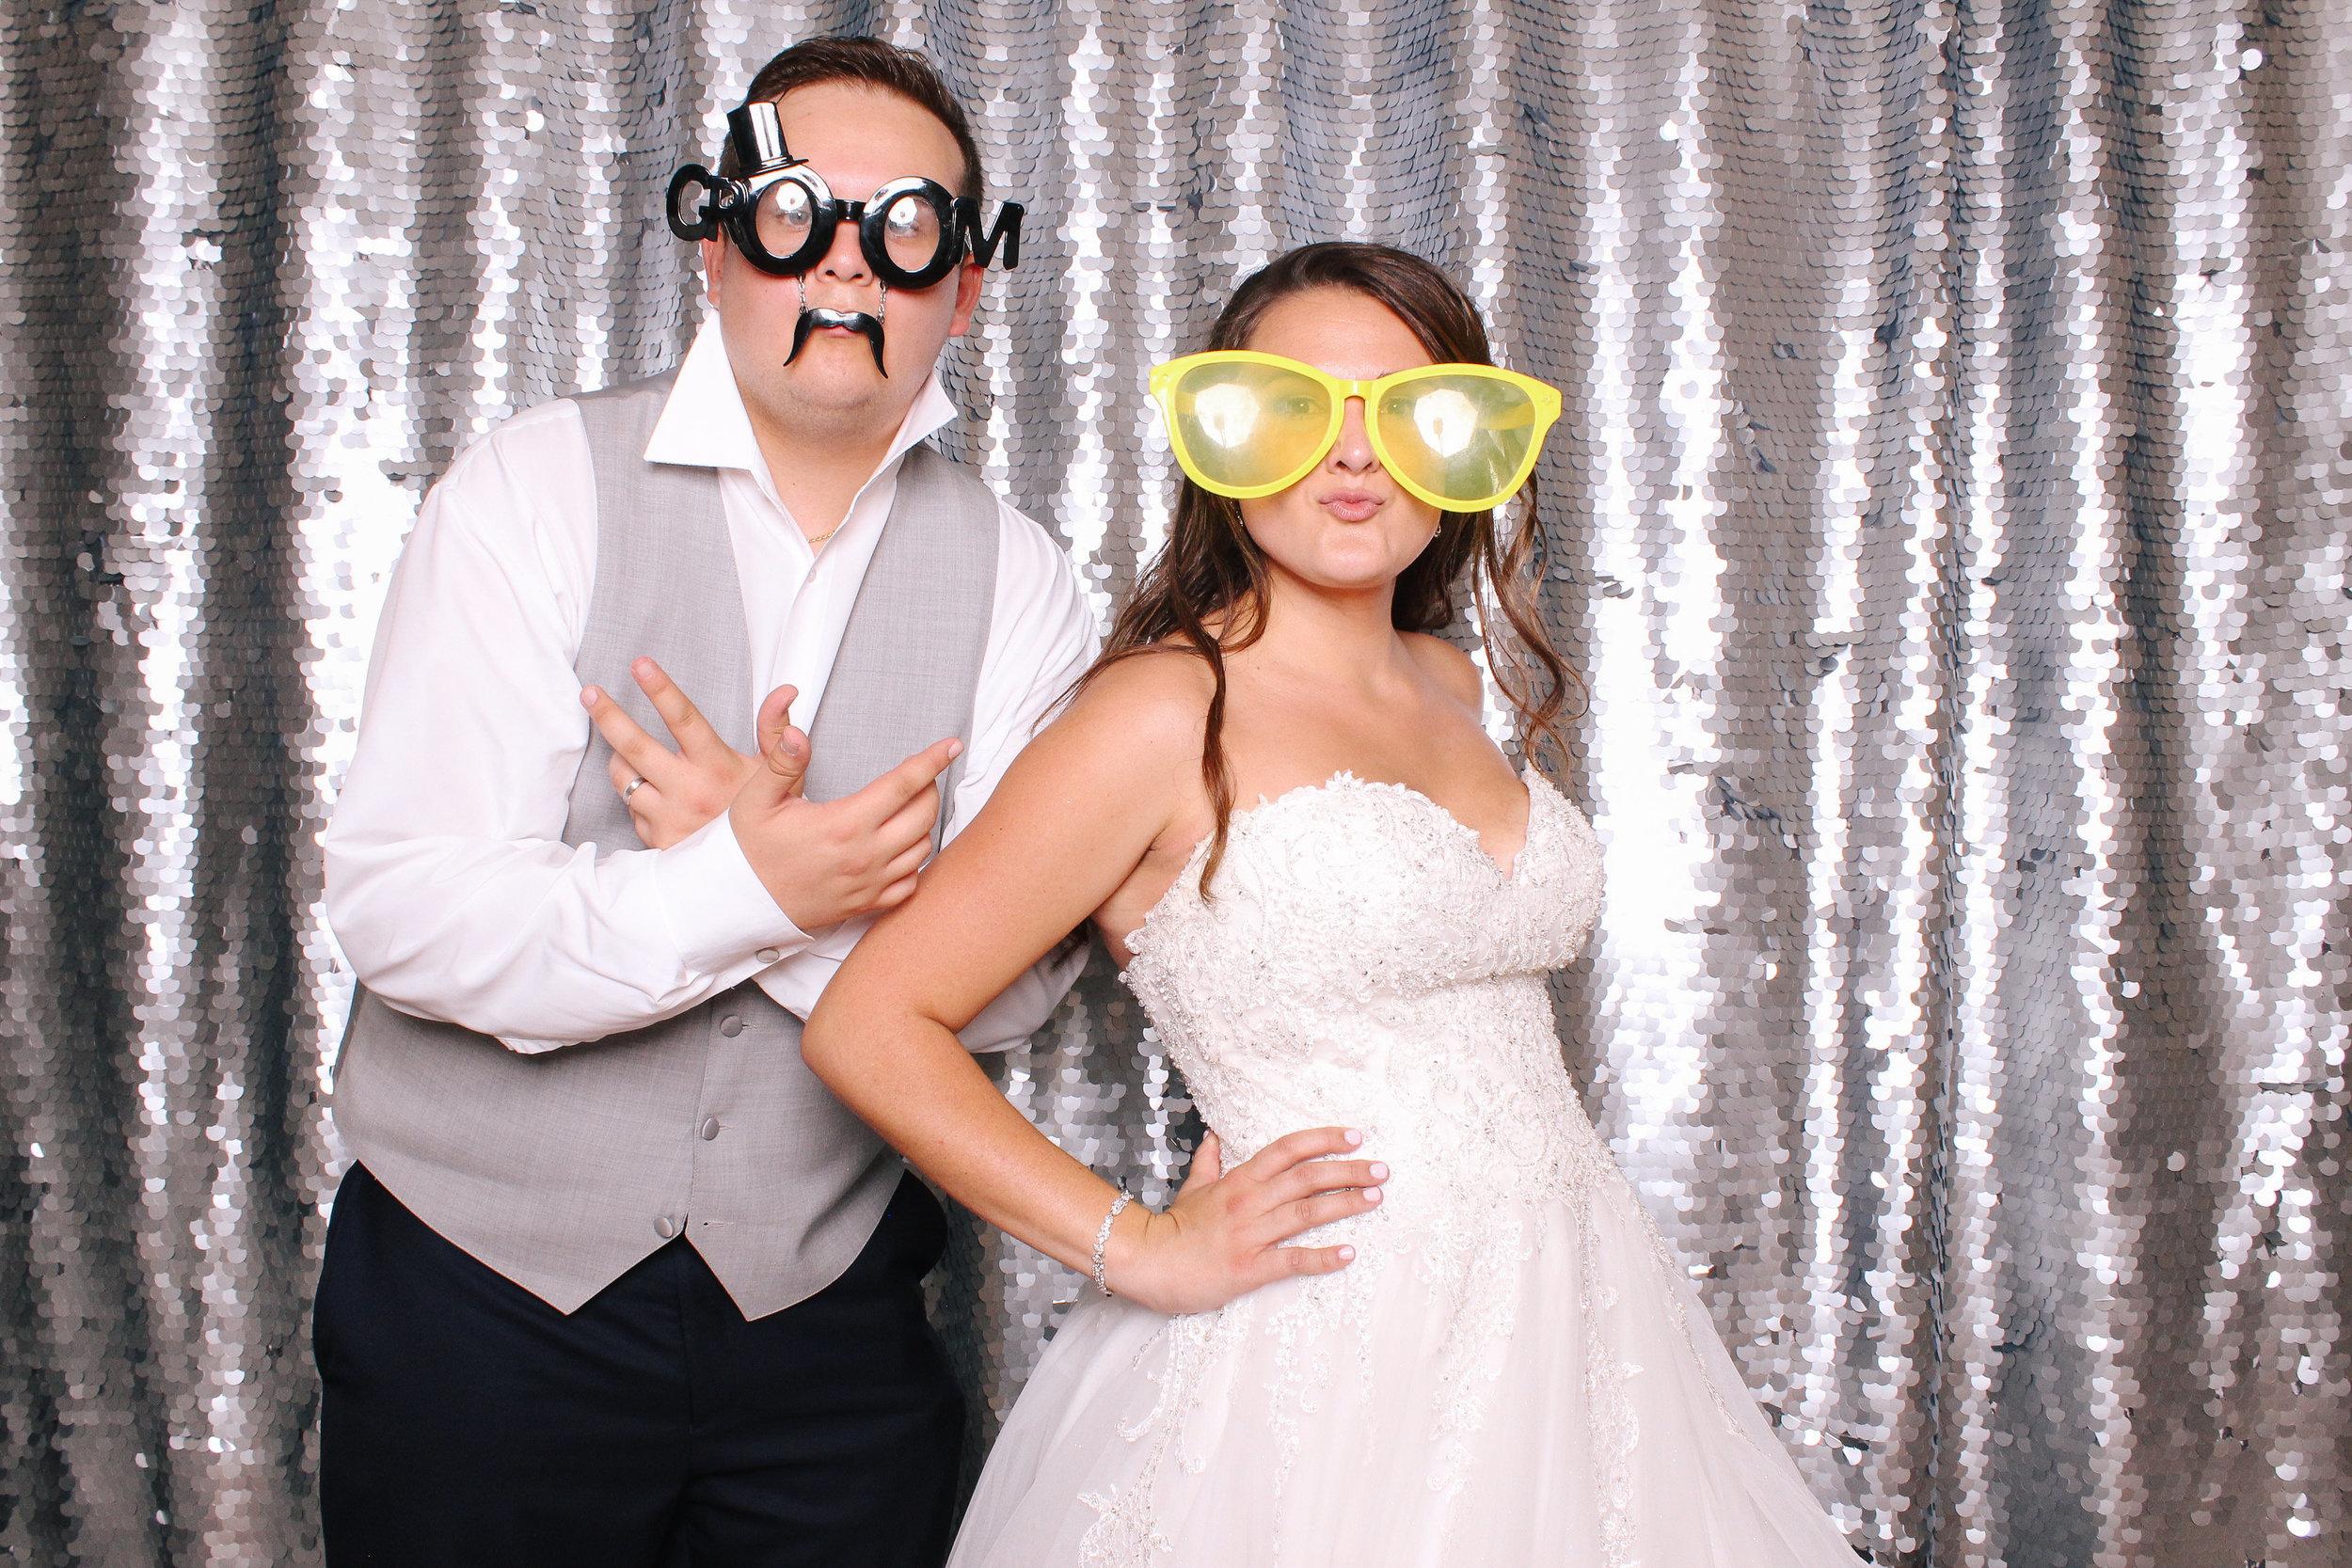 0201 Cleveland Wedding Photobooth too much awesomeness.jpg